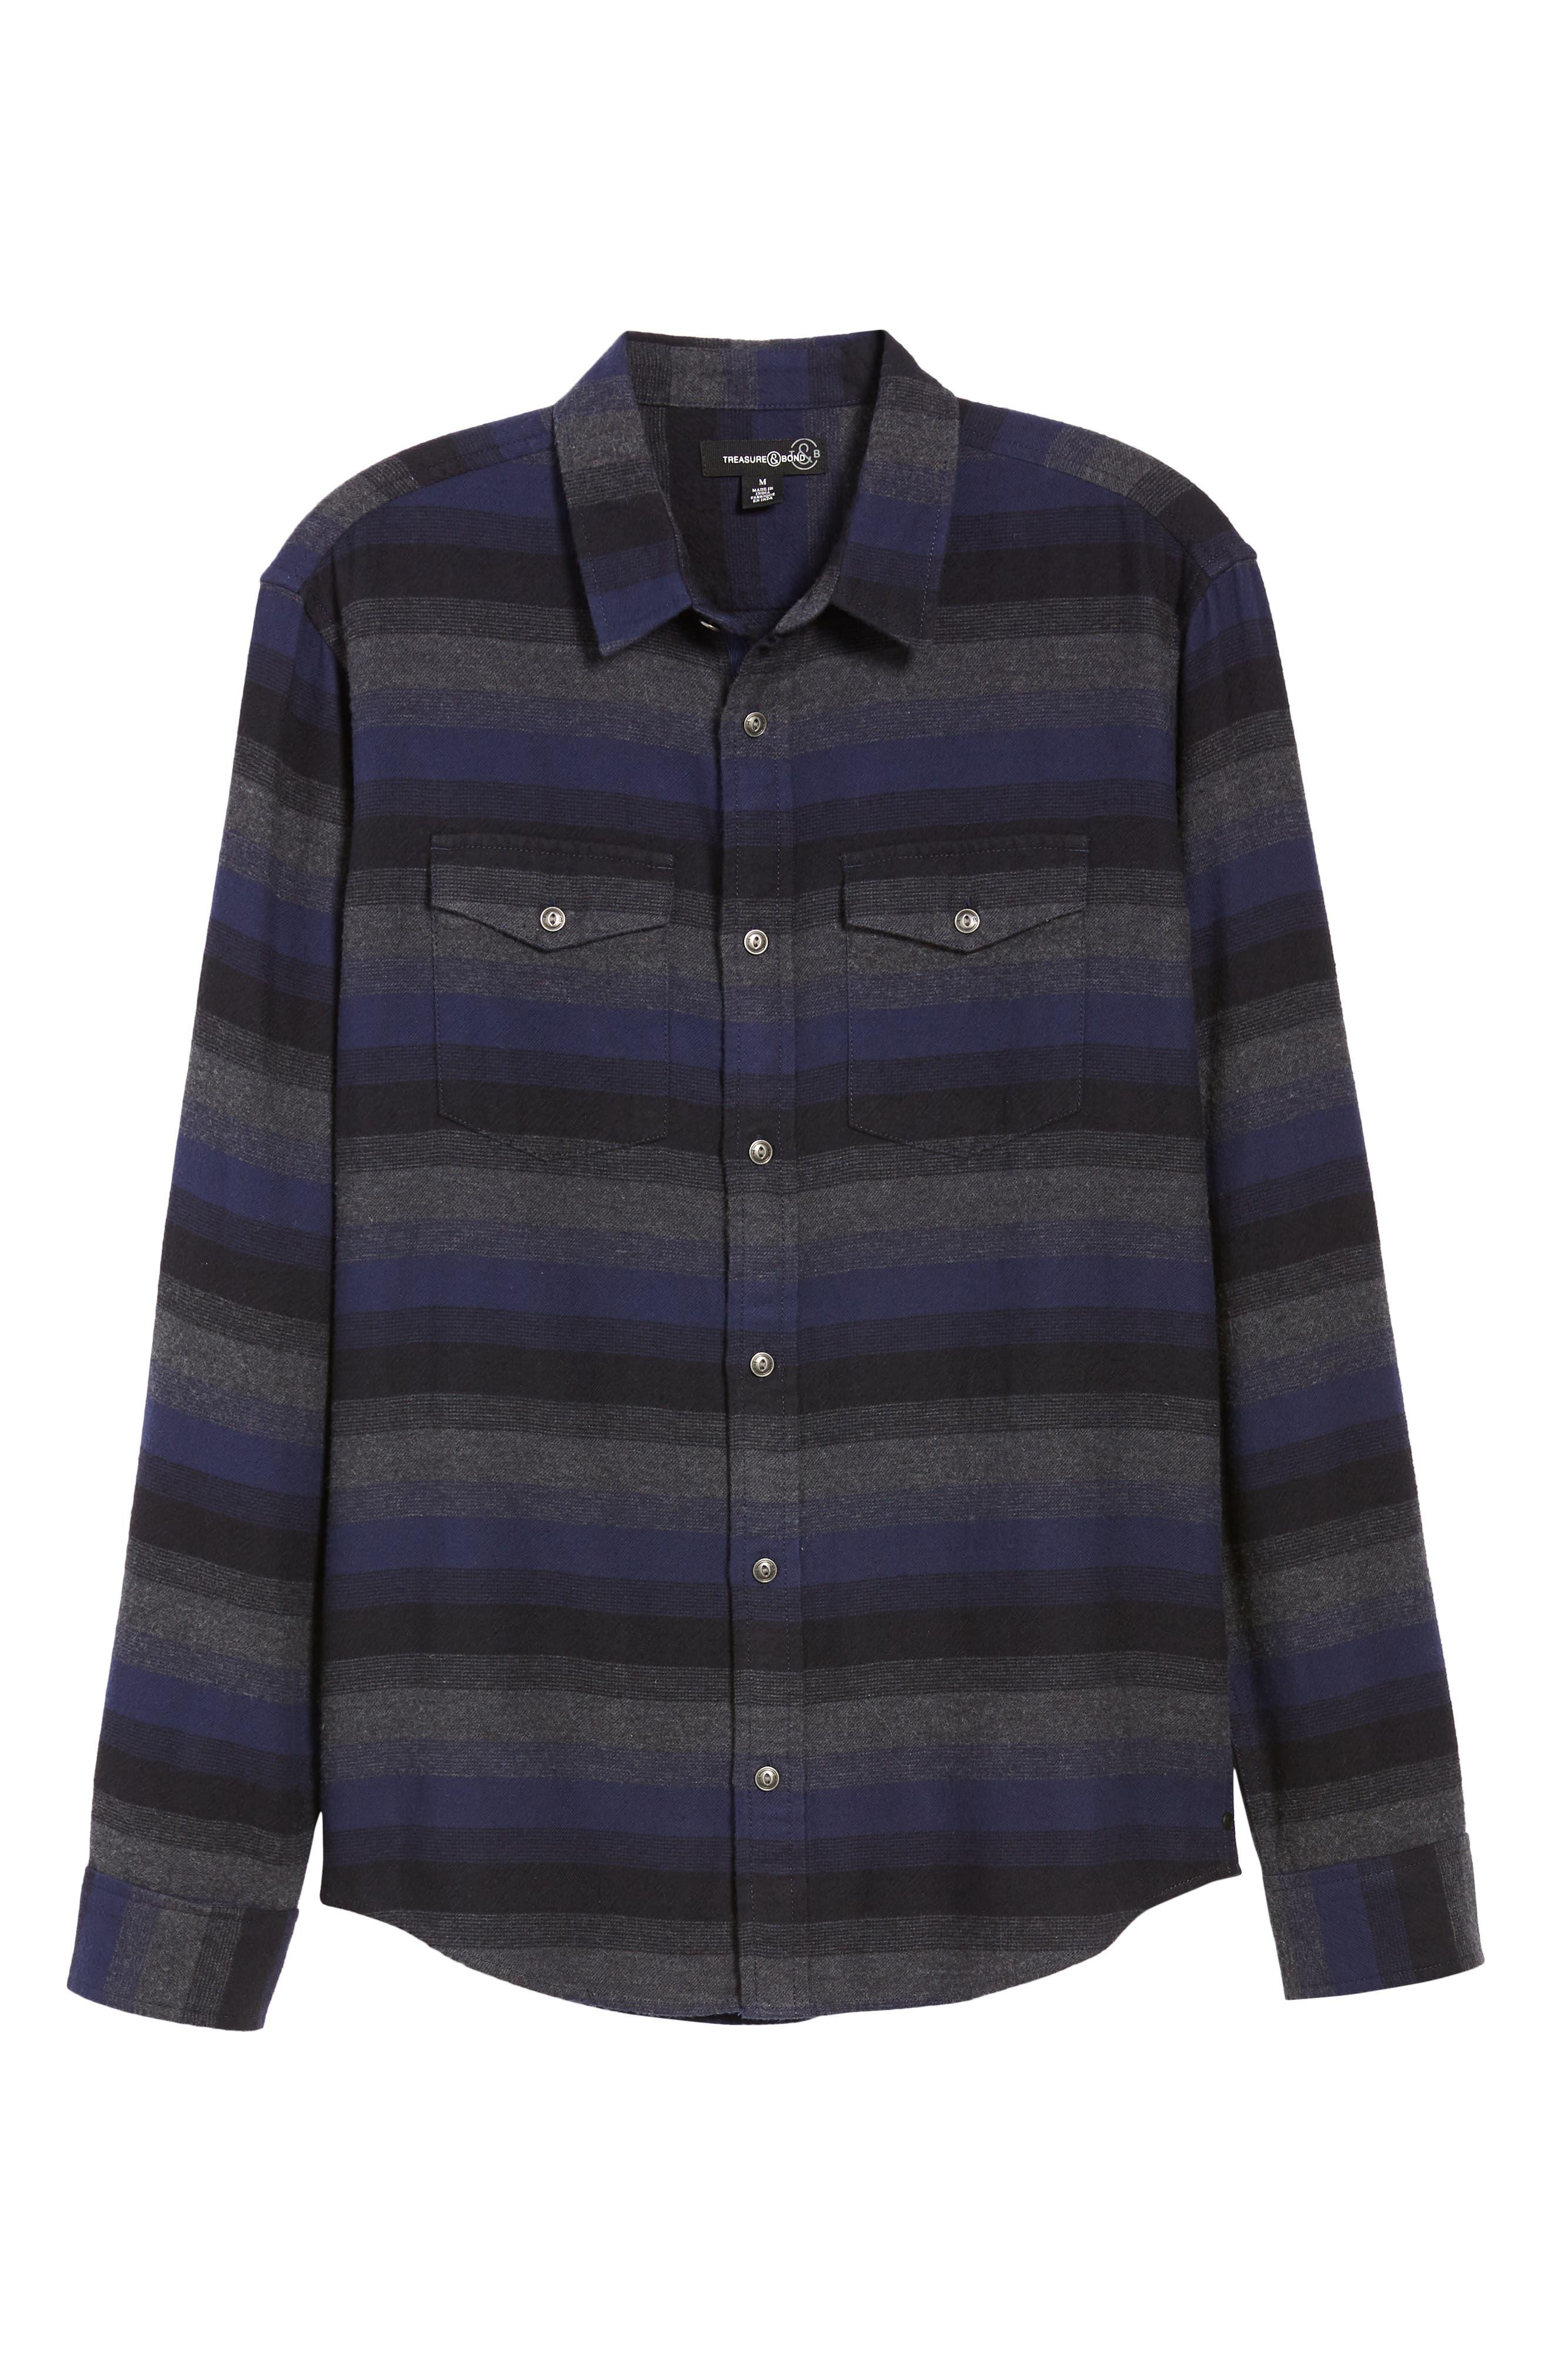 Regular Fit Ombré Sport Shirt,                             Alternate thumbnail 5, color,                             NAVY CHARCOAL OMBRE STRIPE